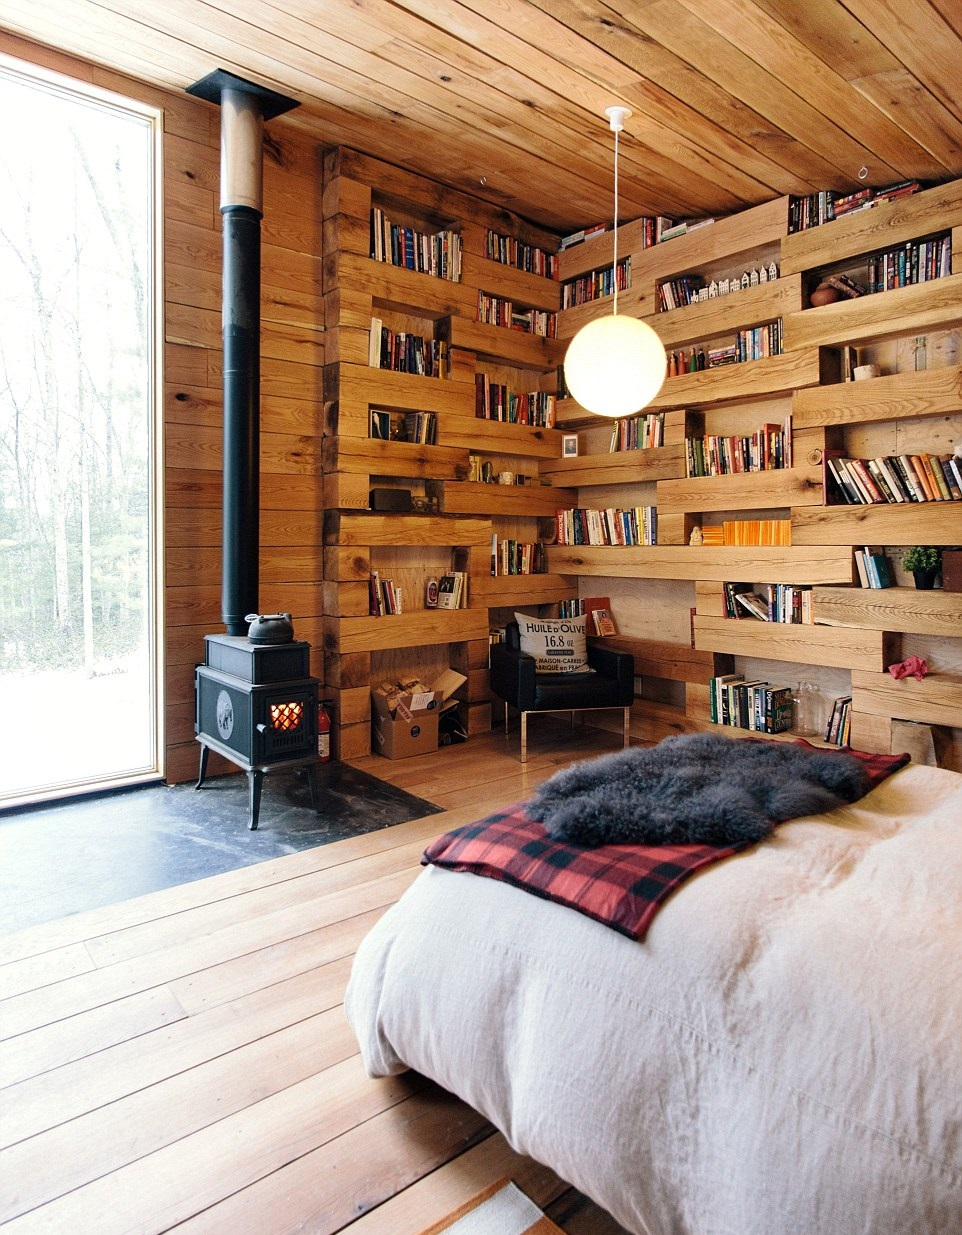 thenordroom-cabin8.jpg